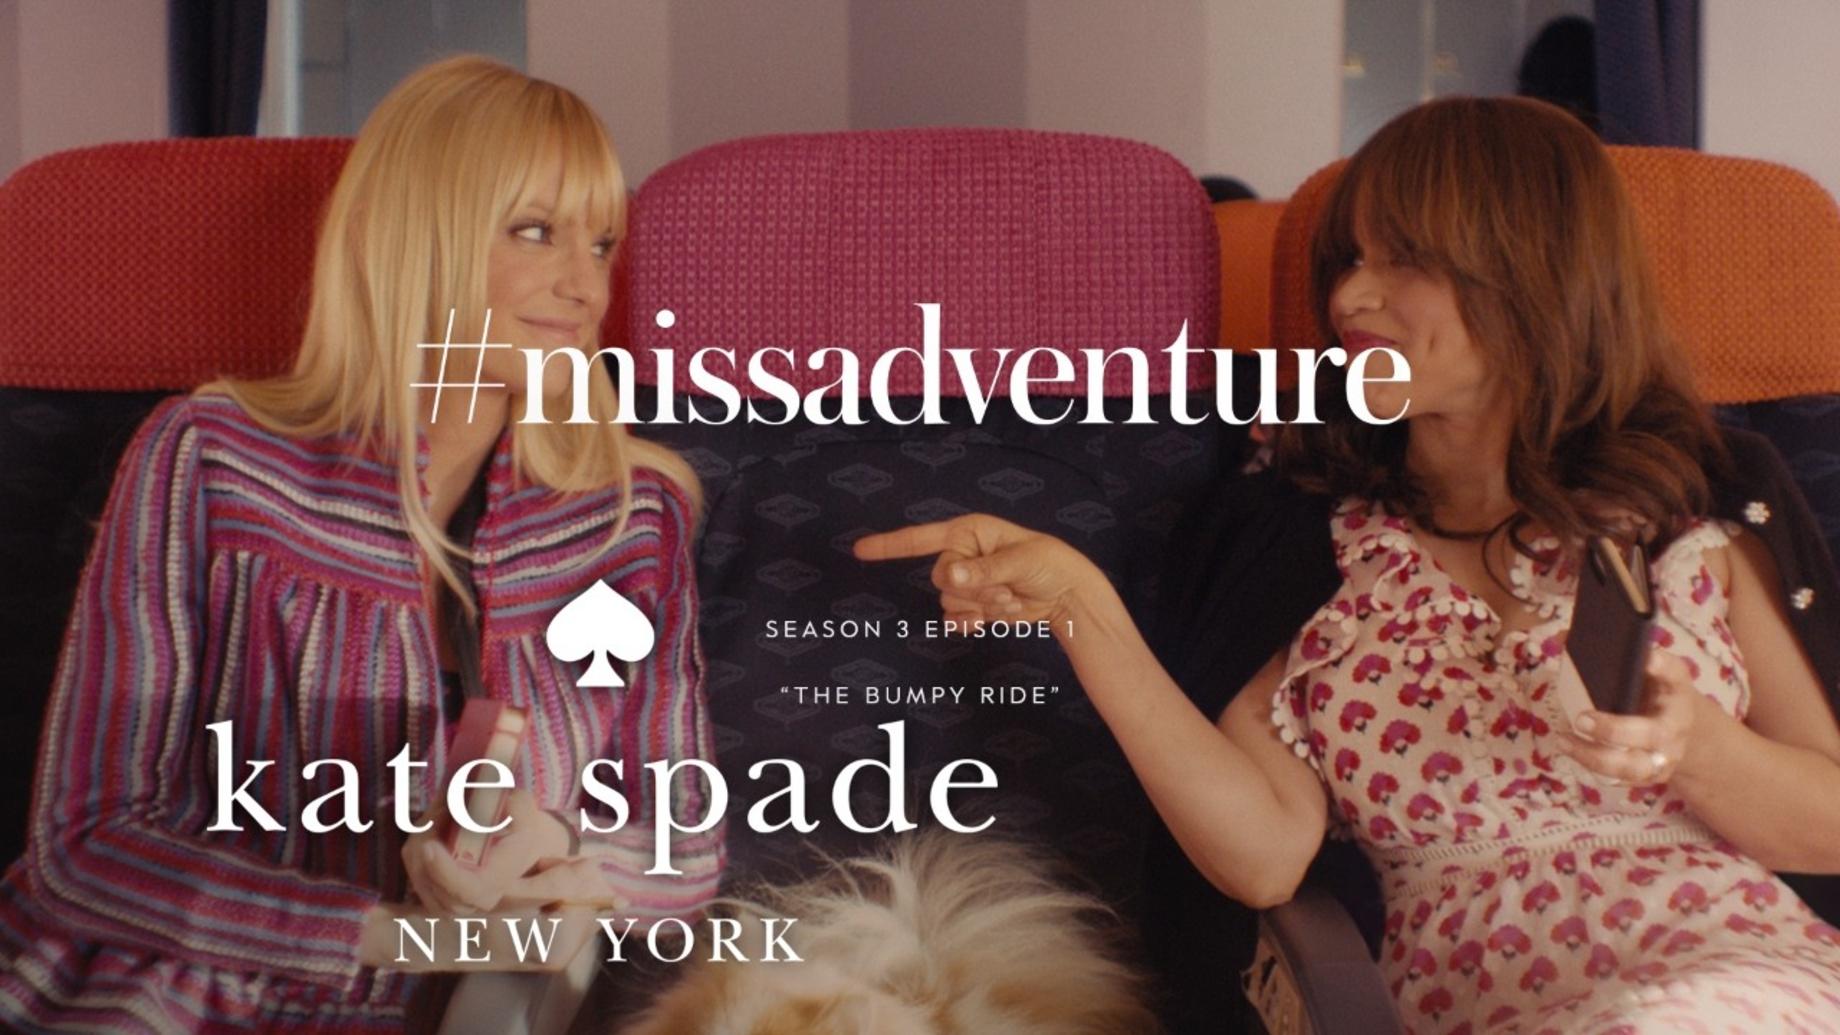 Anna Faris & Rosie Perez in #missadventure: the bumpy ride